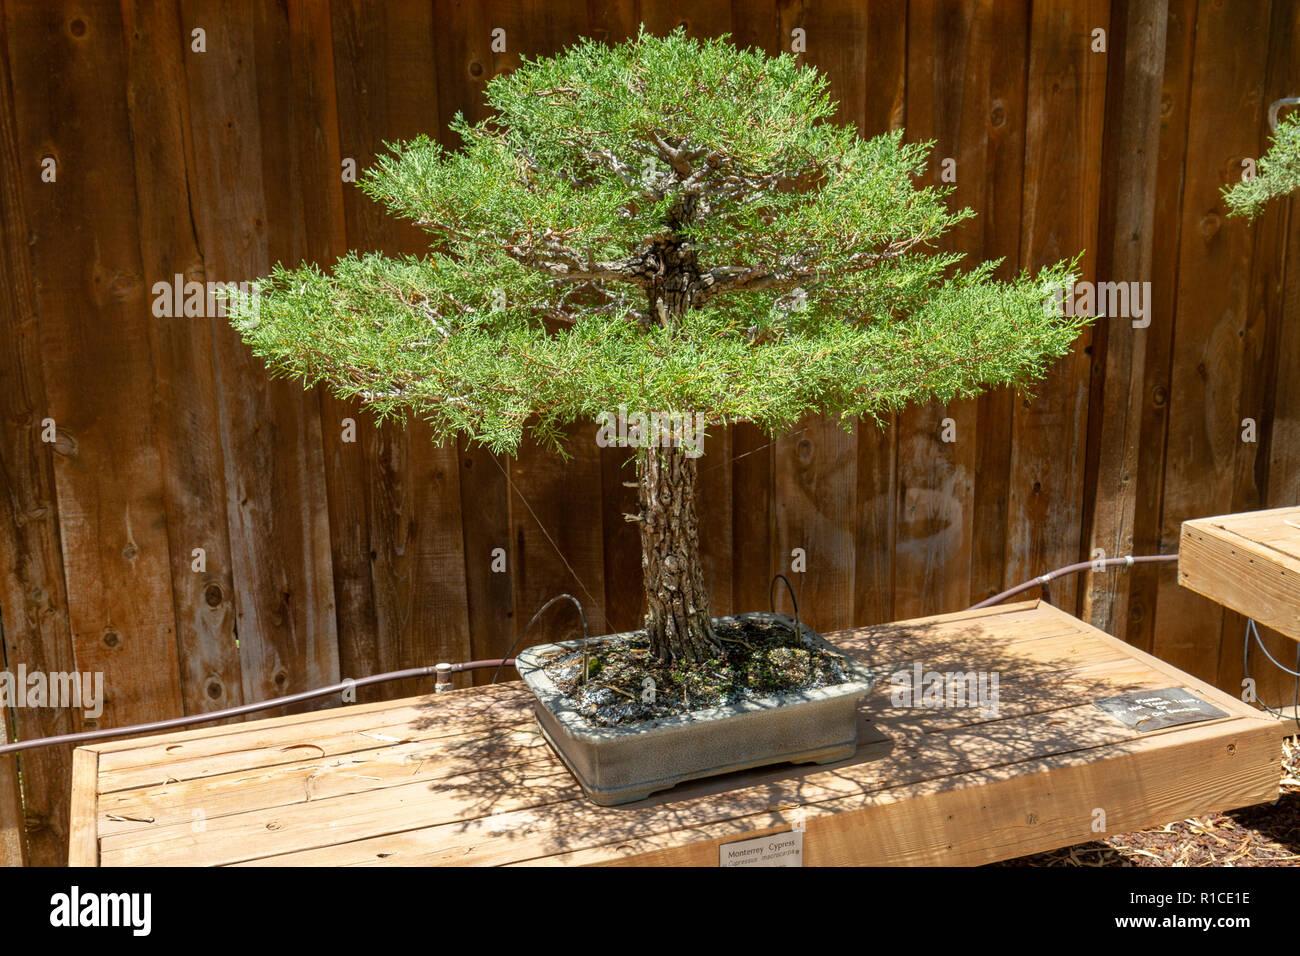 A Monterrey Cypress Cupressus Macrocarpa Of The Bonsai Pavilion San Diego Zoo Safari Park Escondido Ca United States Stock Photo Alamy